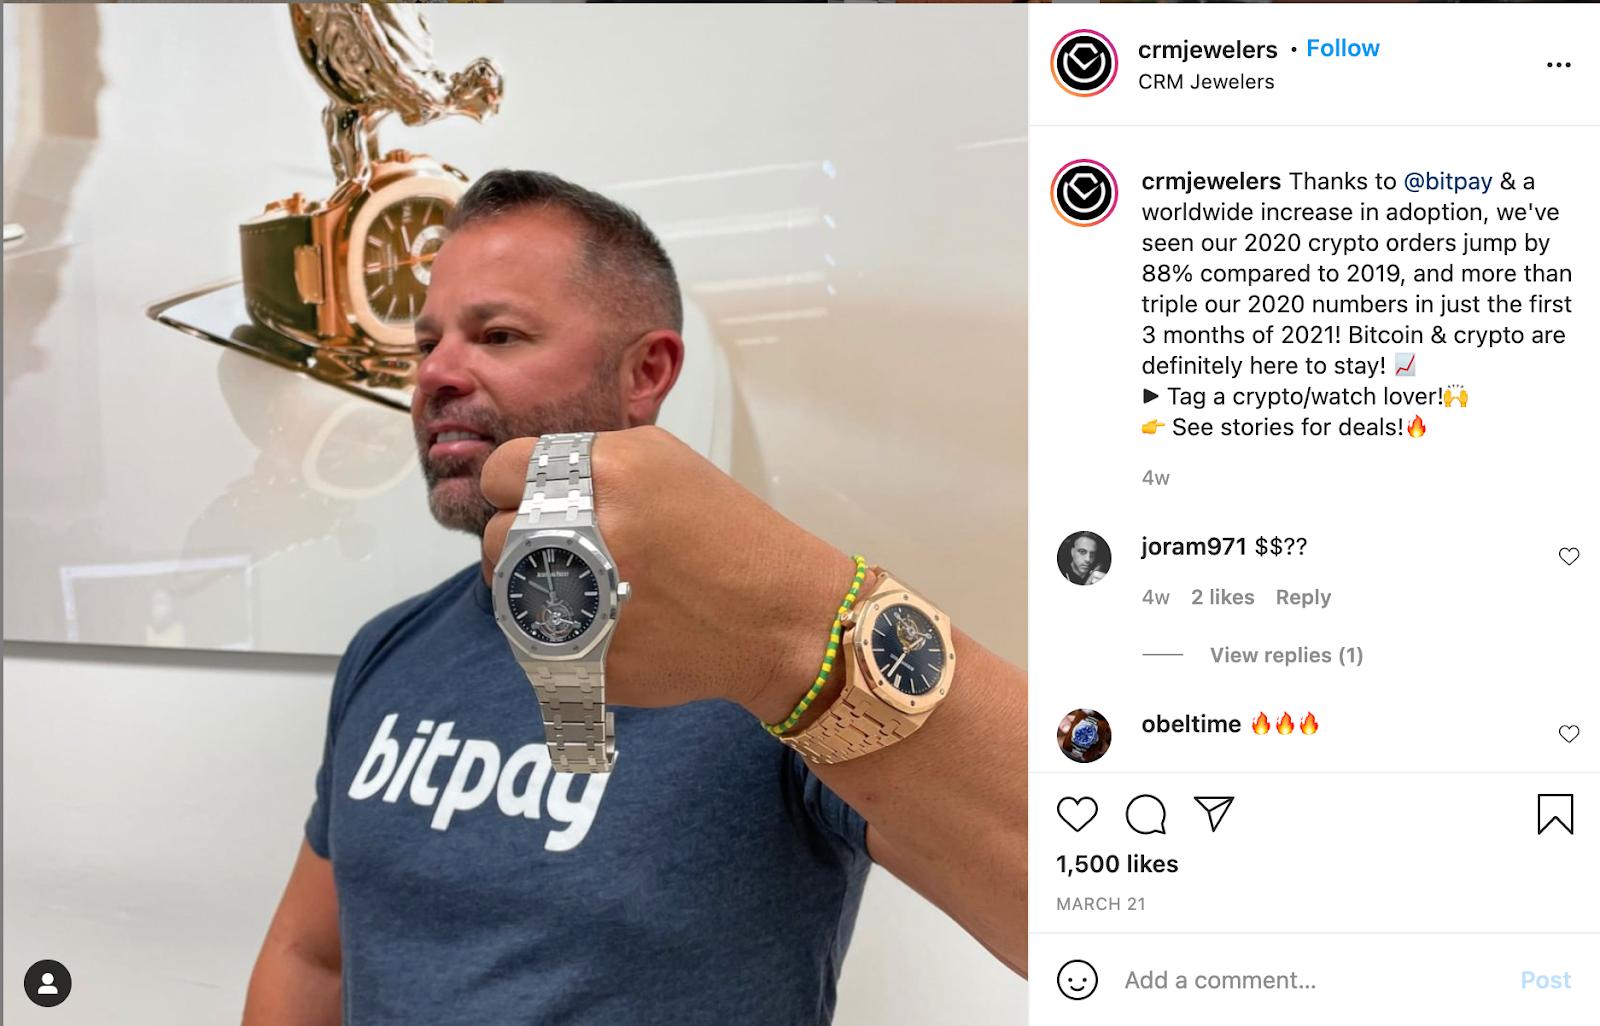 CRM Jewelers showcasing a watch on Instagram